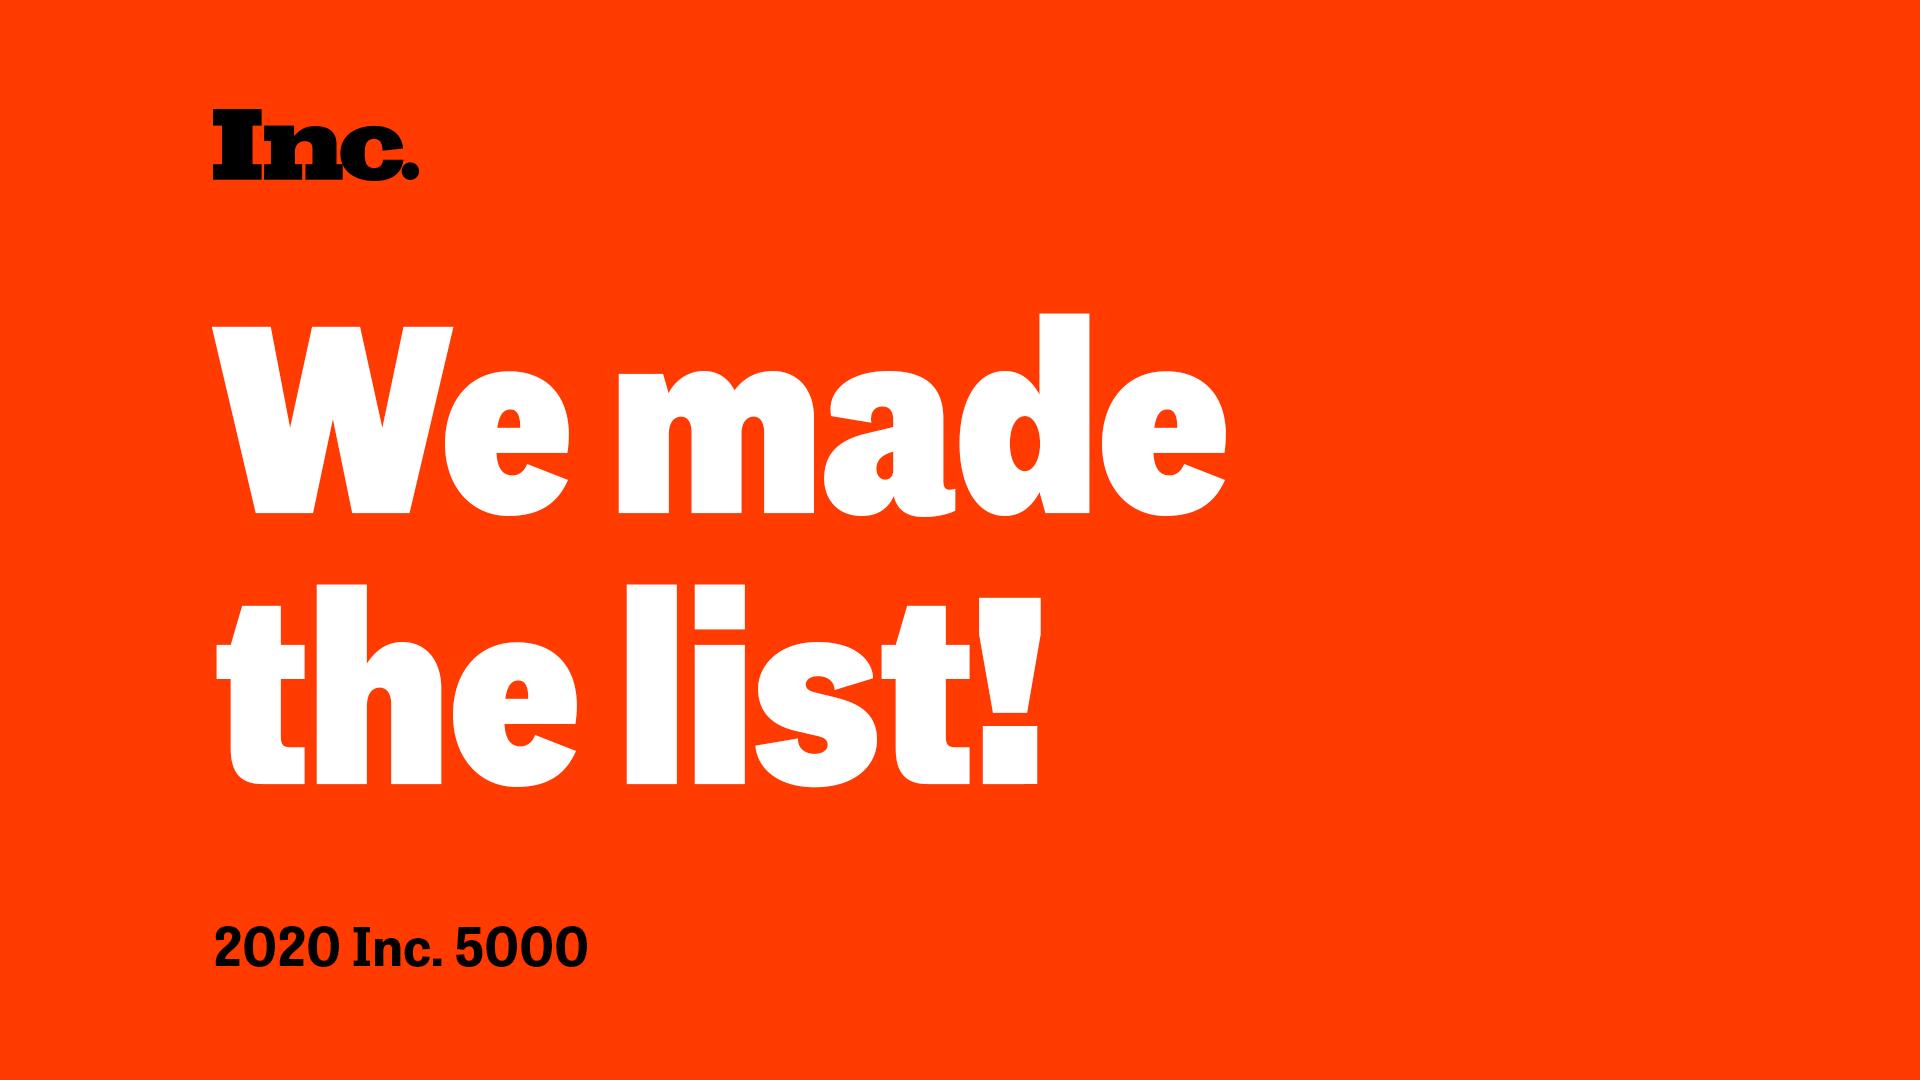 Newline Interactive 2020 Inc. 5000